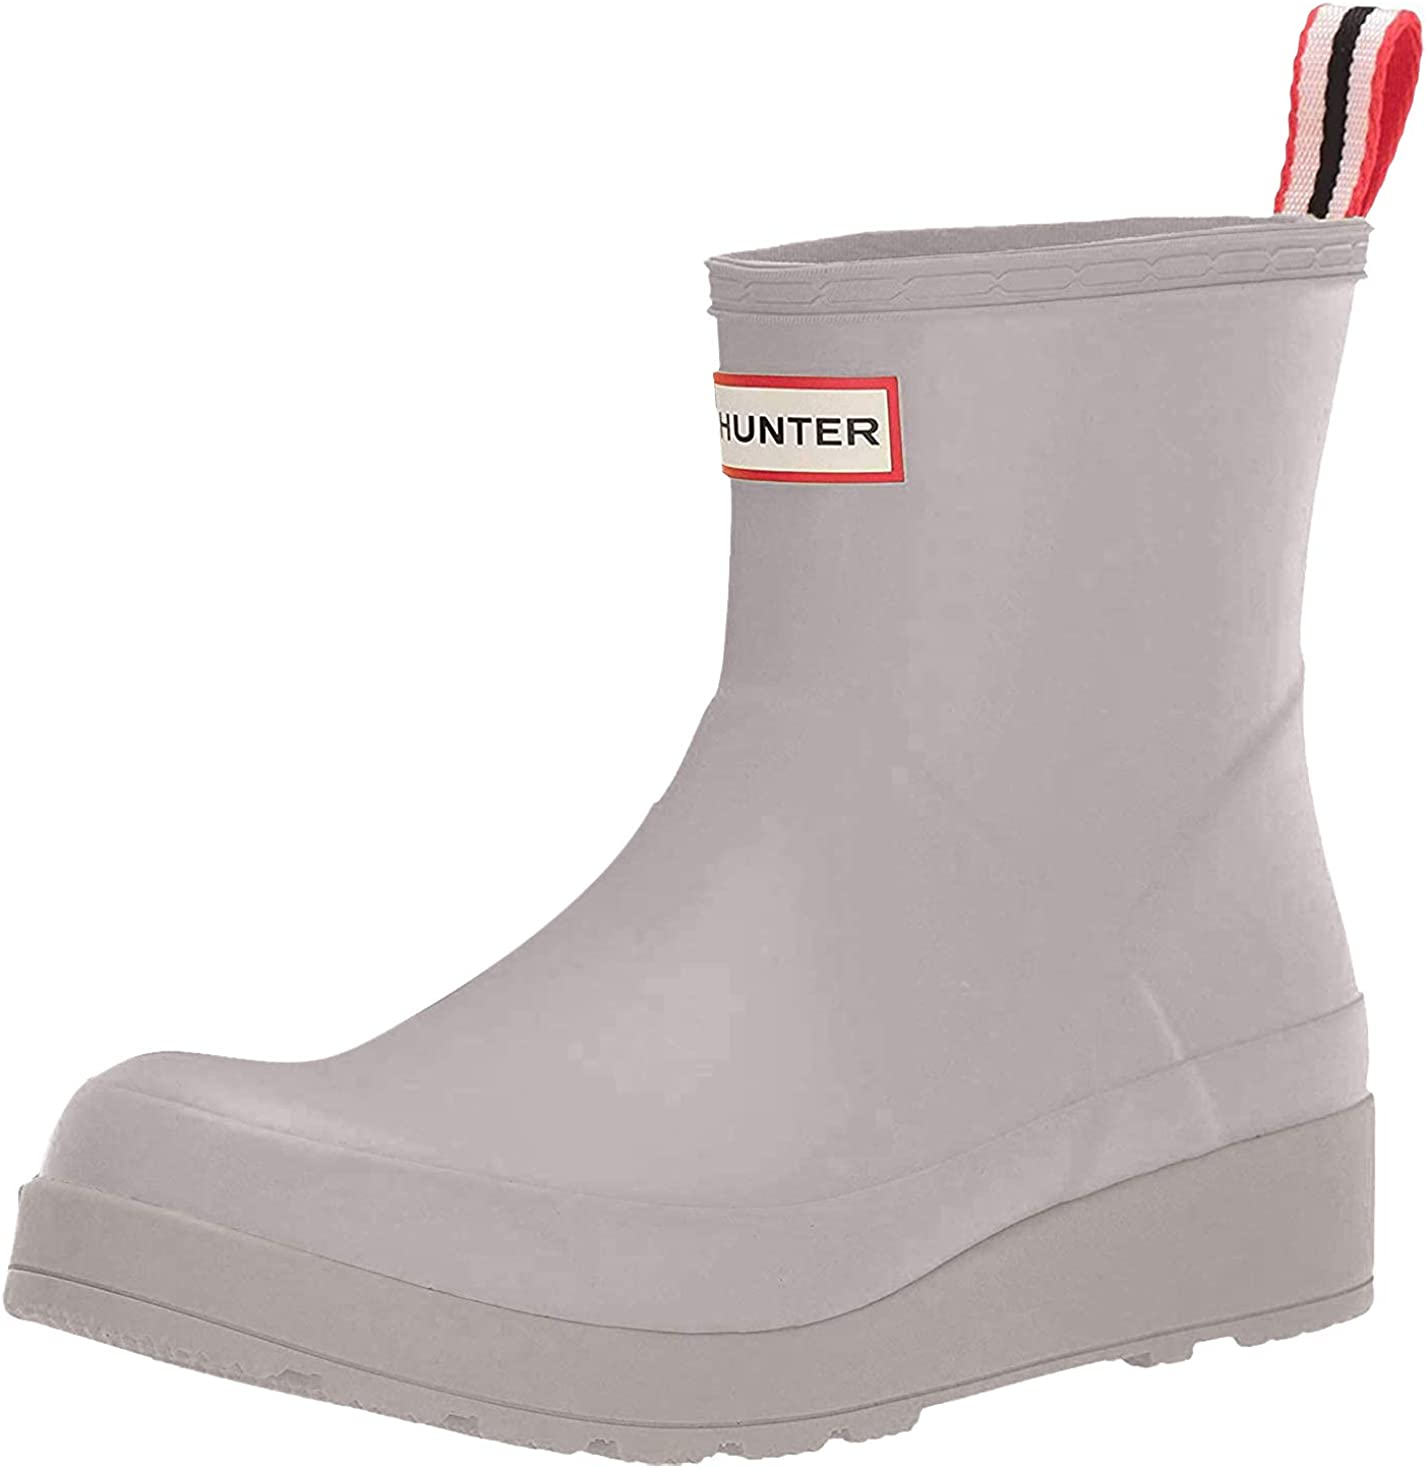 HUNTER Women's Rain mart online shopping Boot m ys Yellow